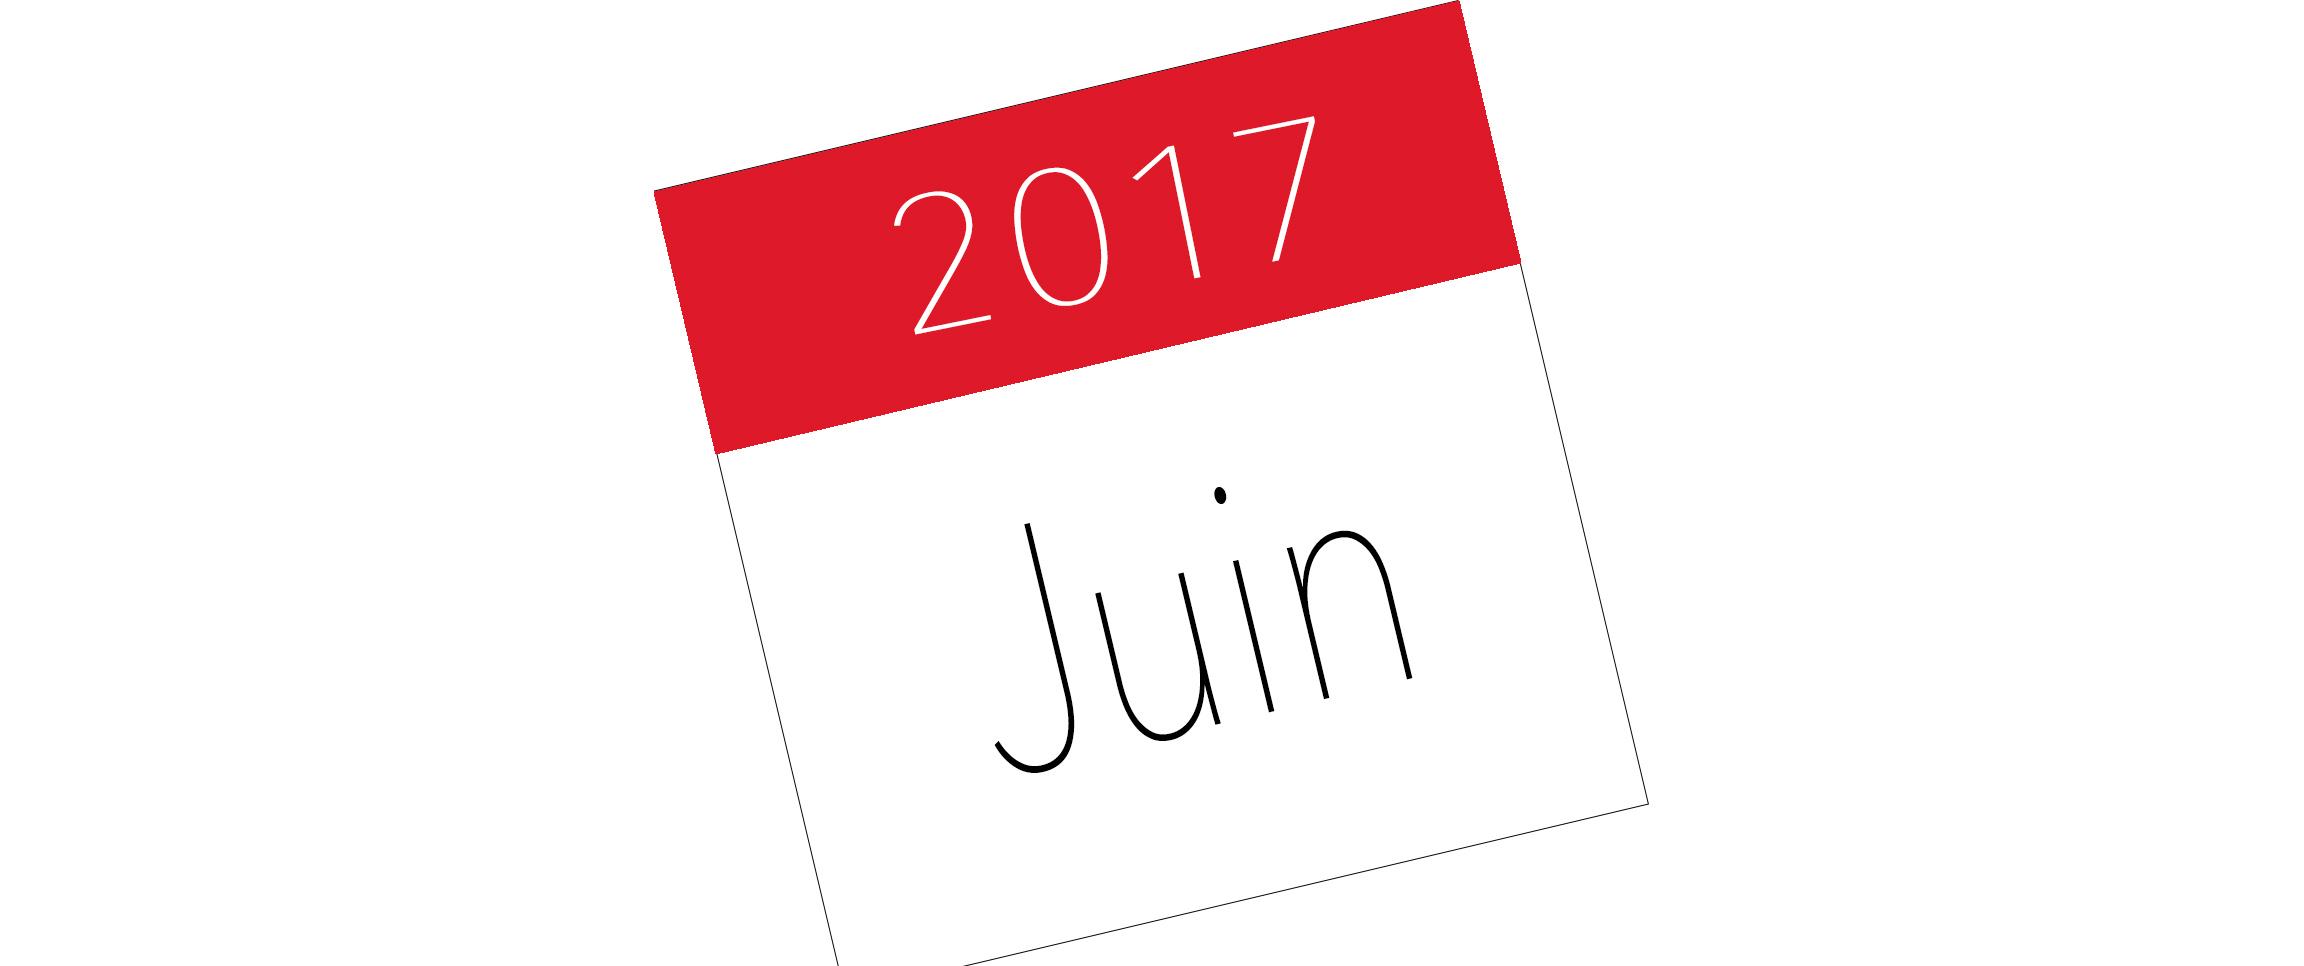 calendrier-site-juin-2017.jpg